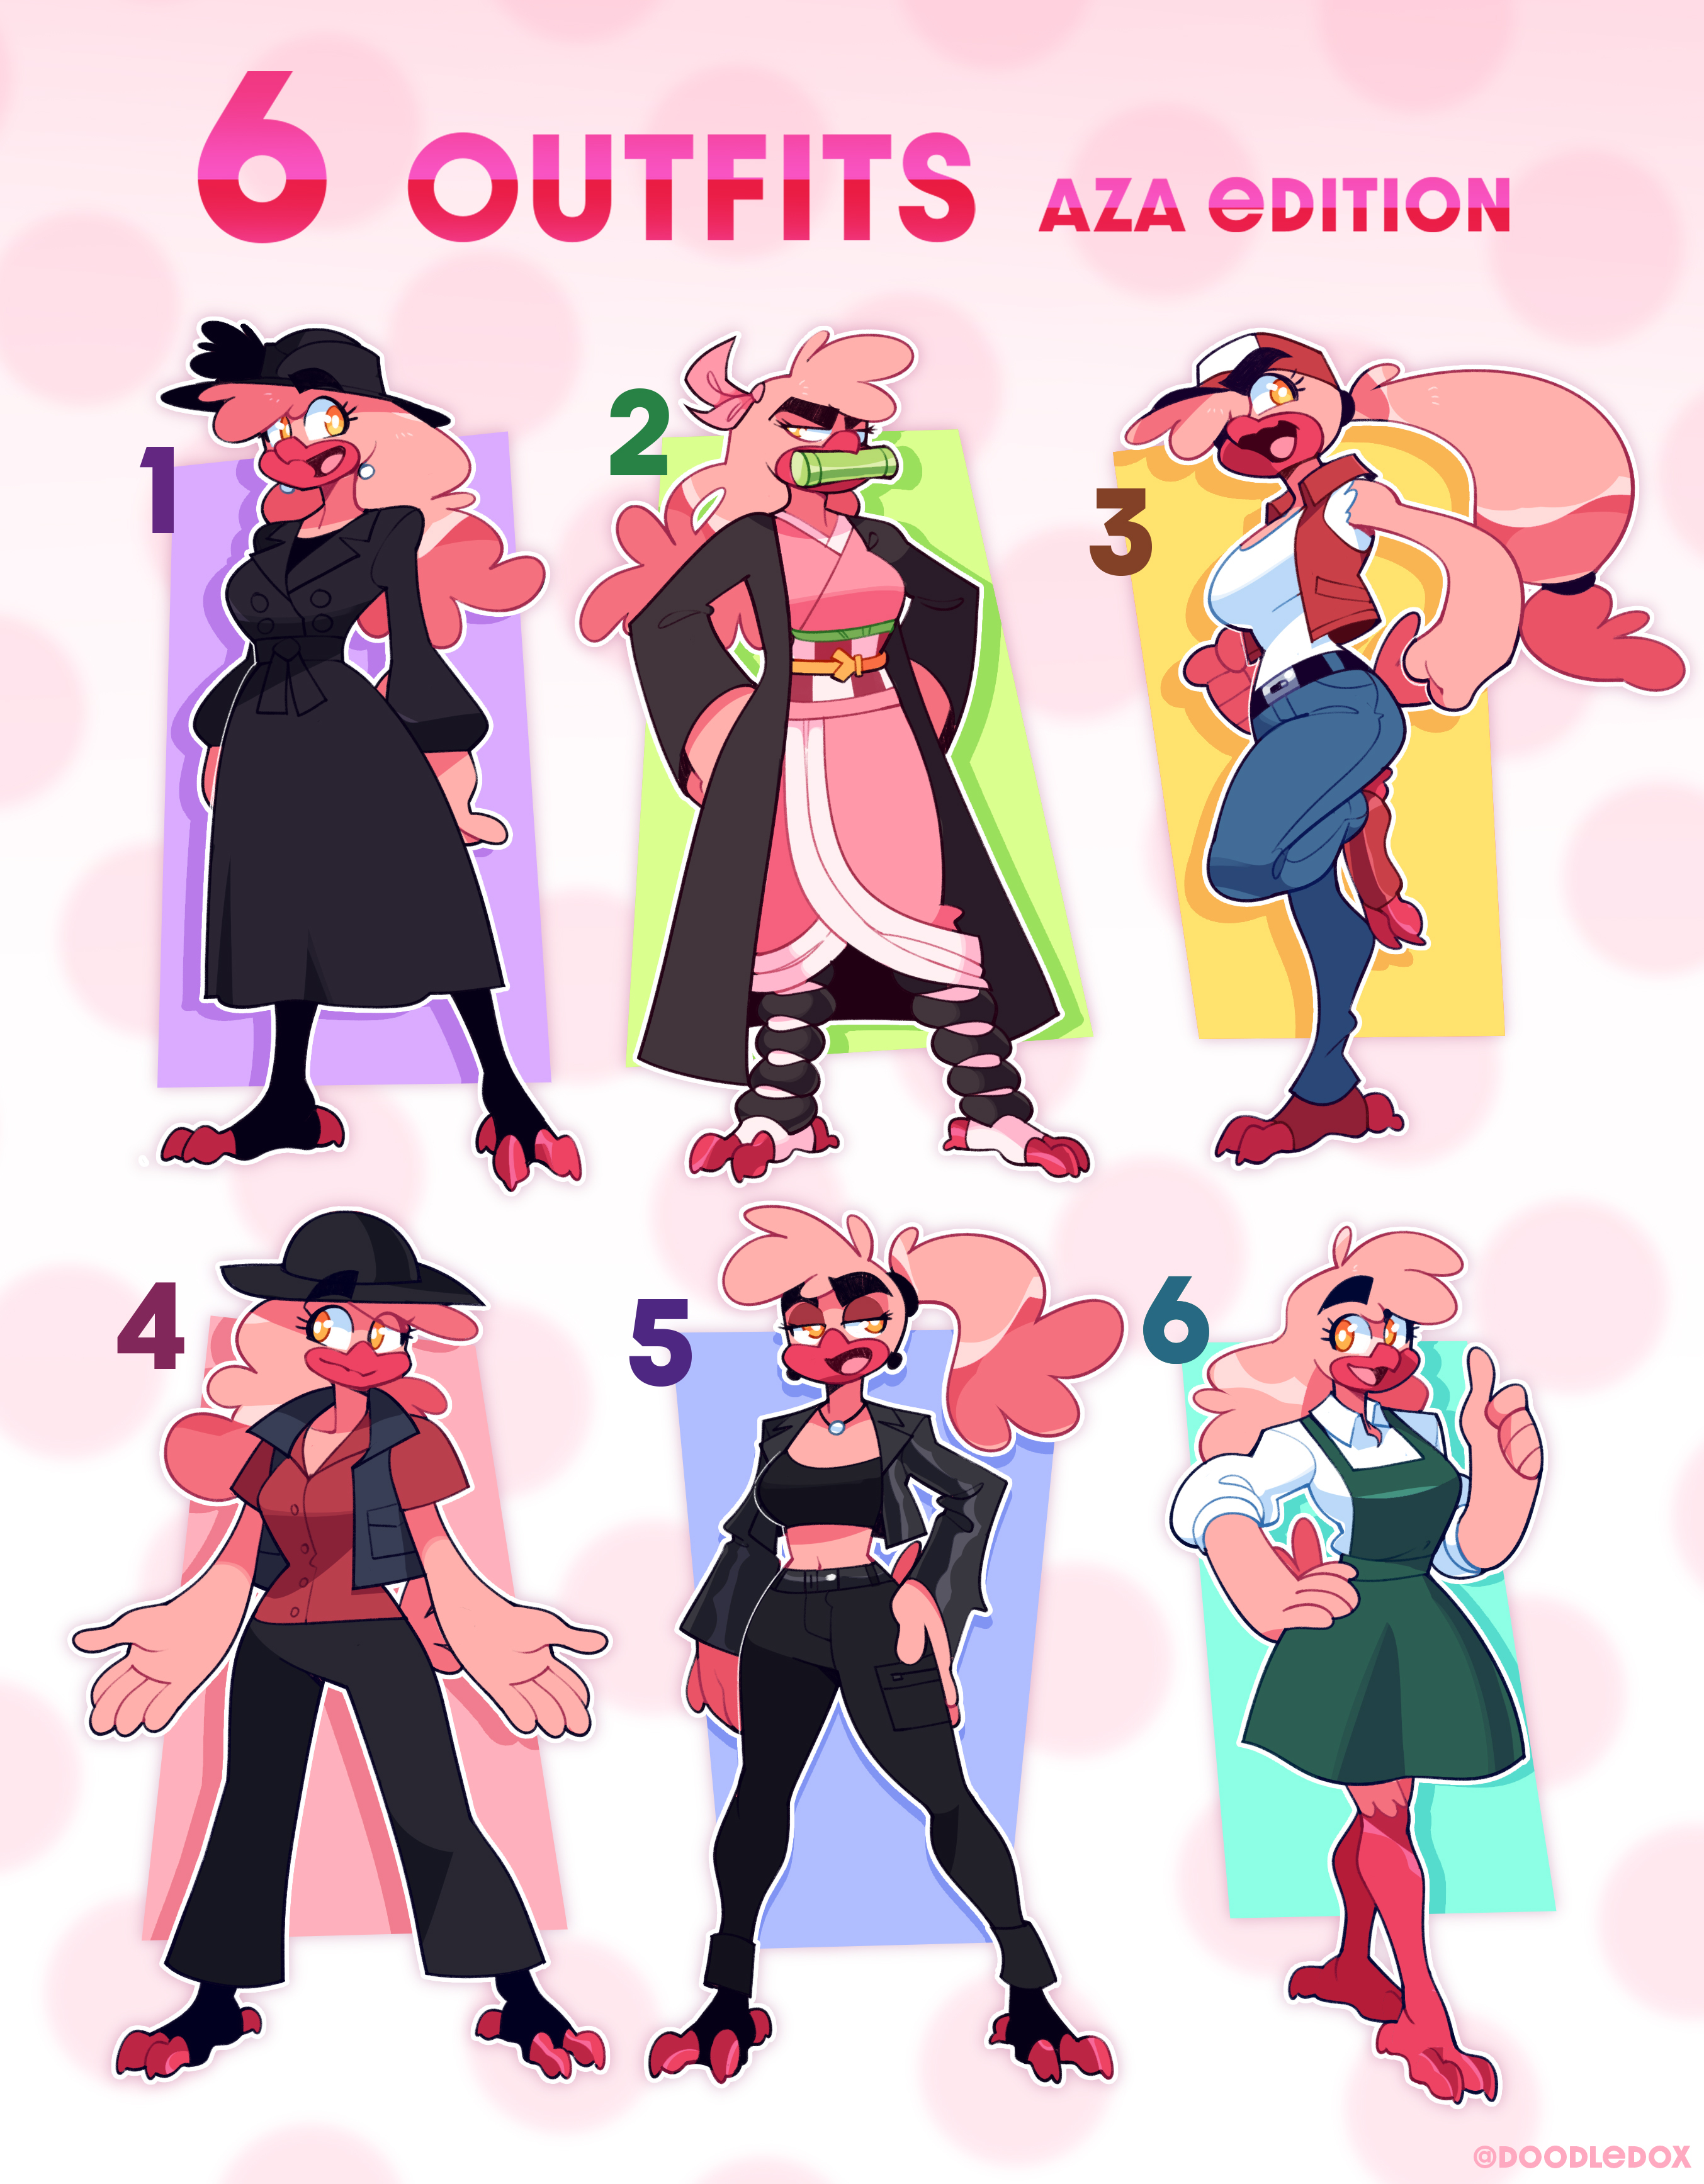 6 Outfits Meme - Aza